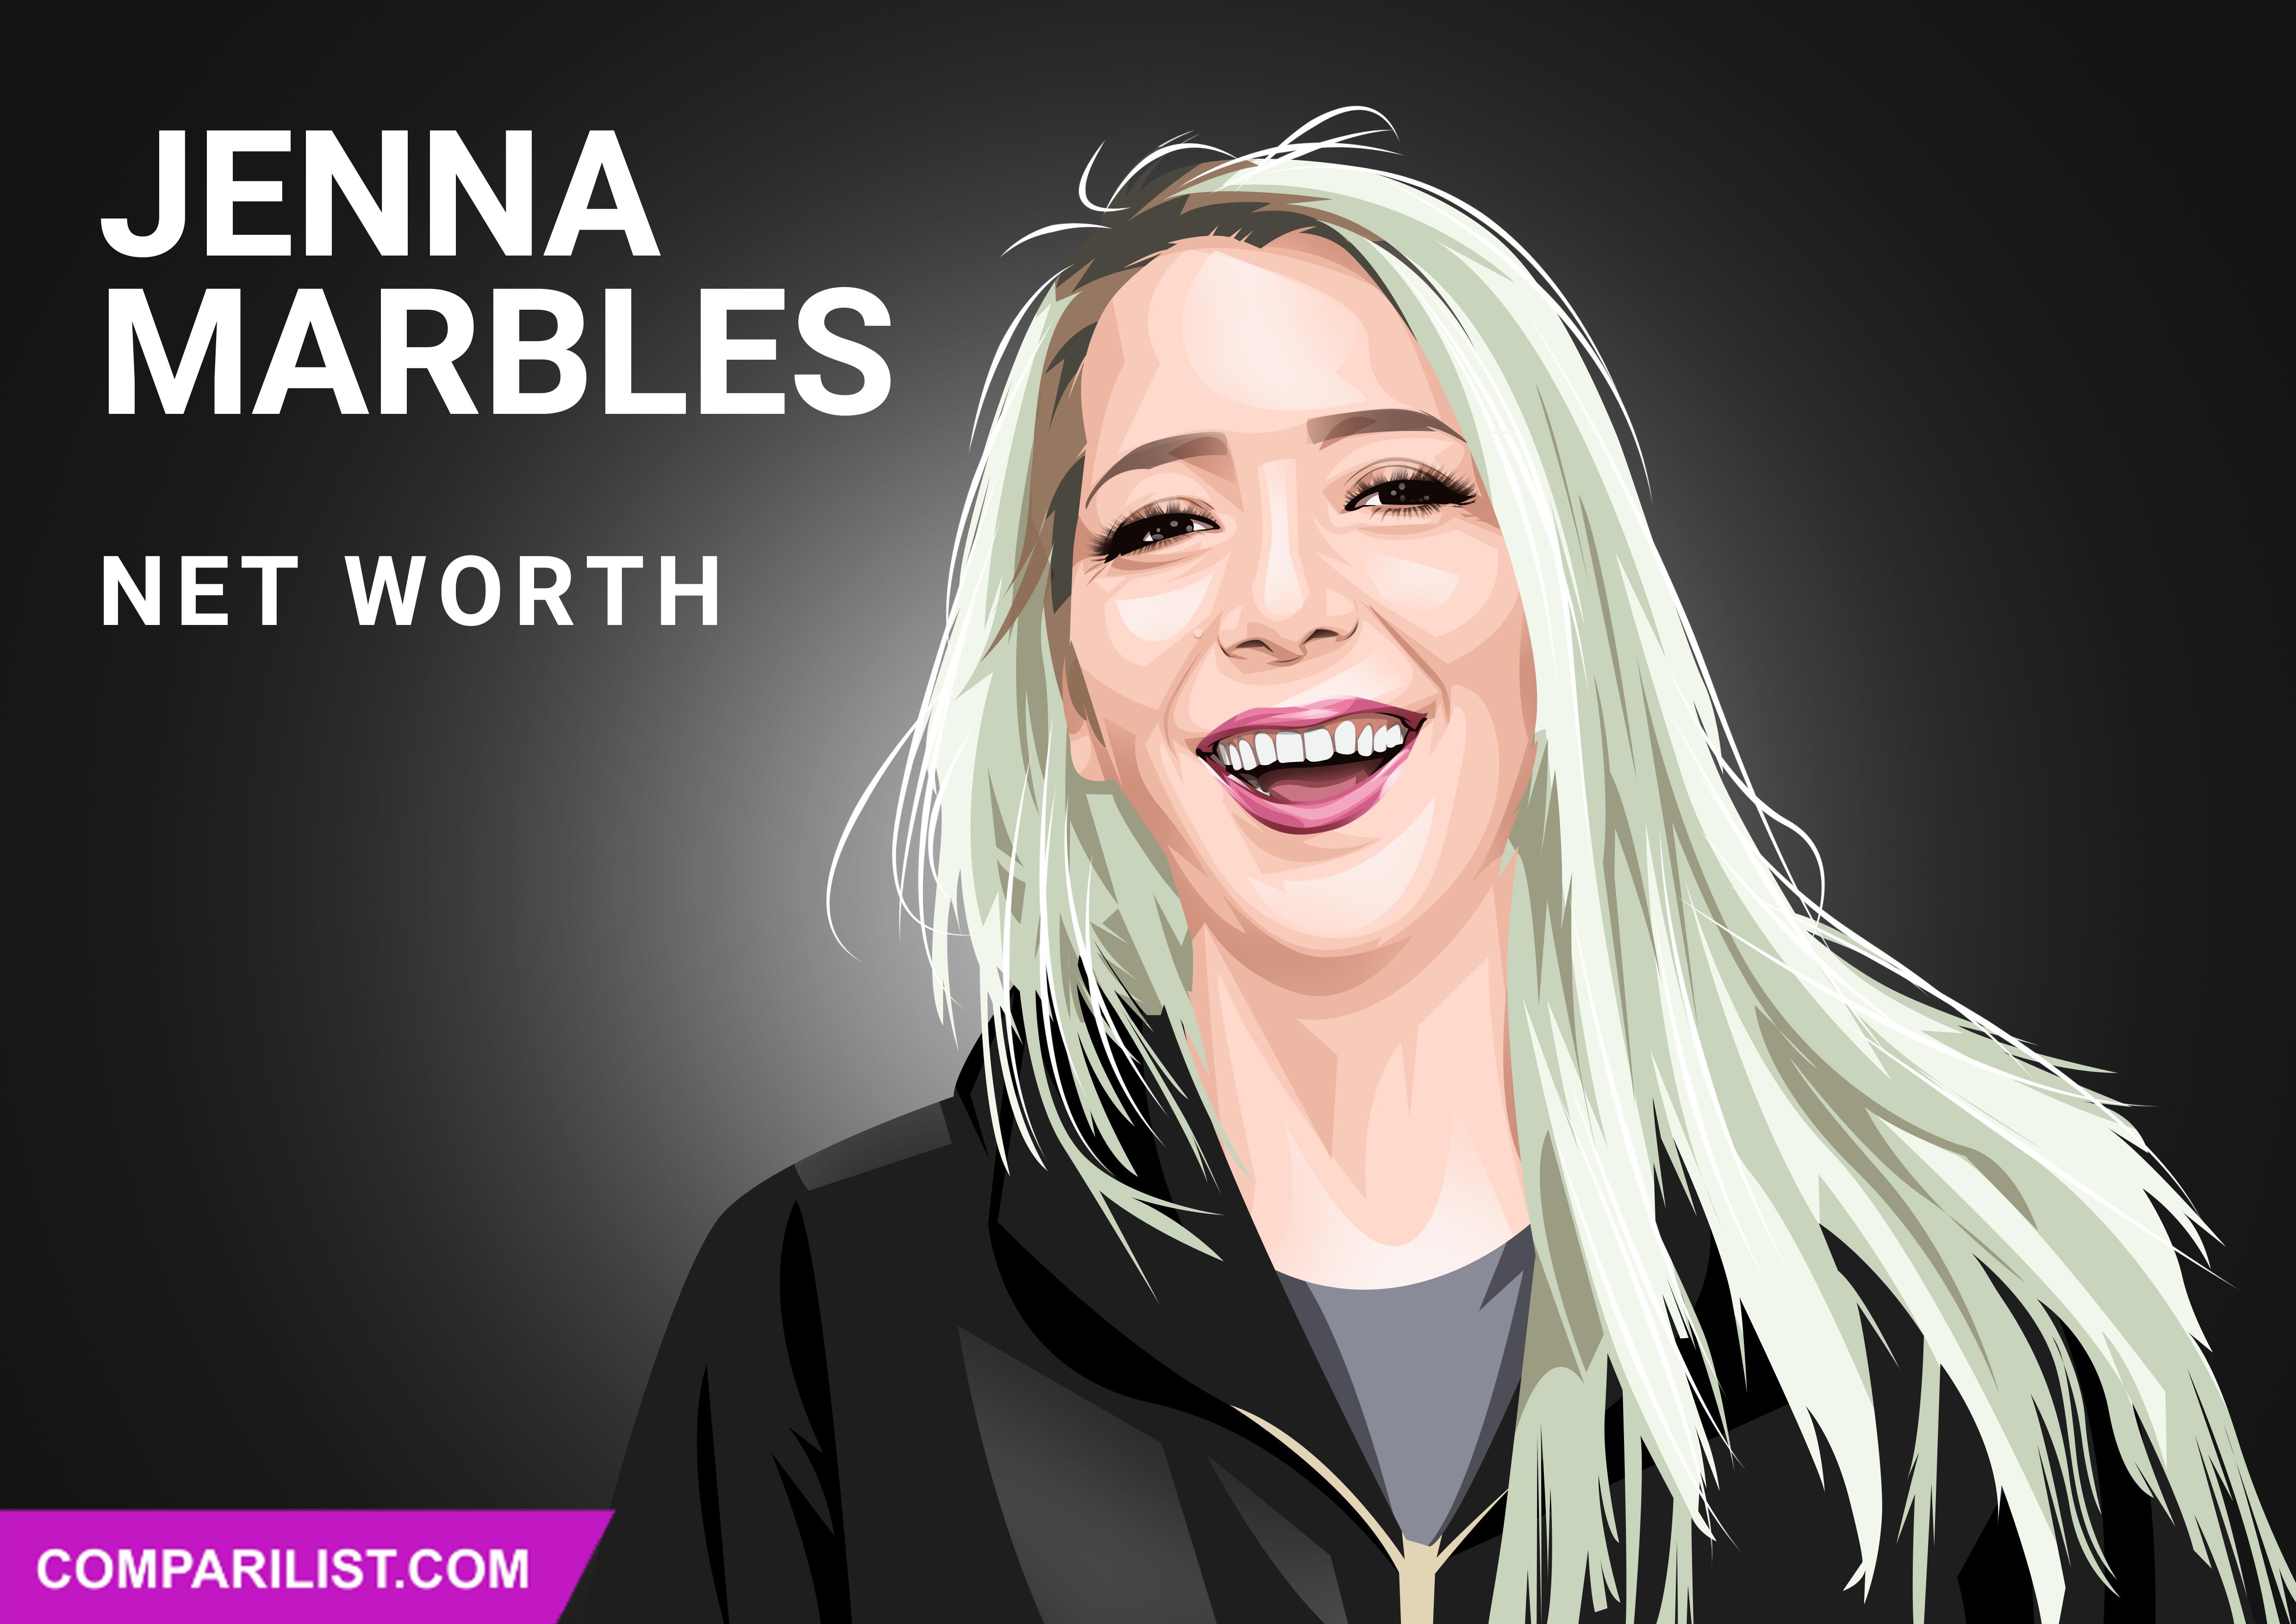 jenna marbles net worth 2019